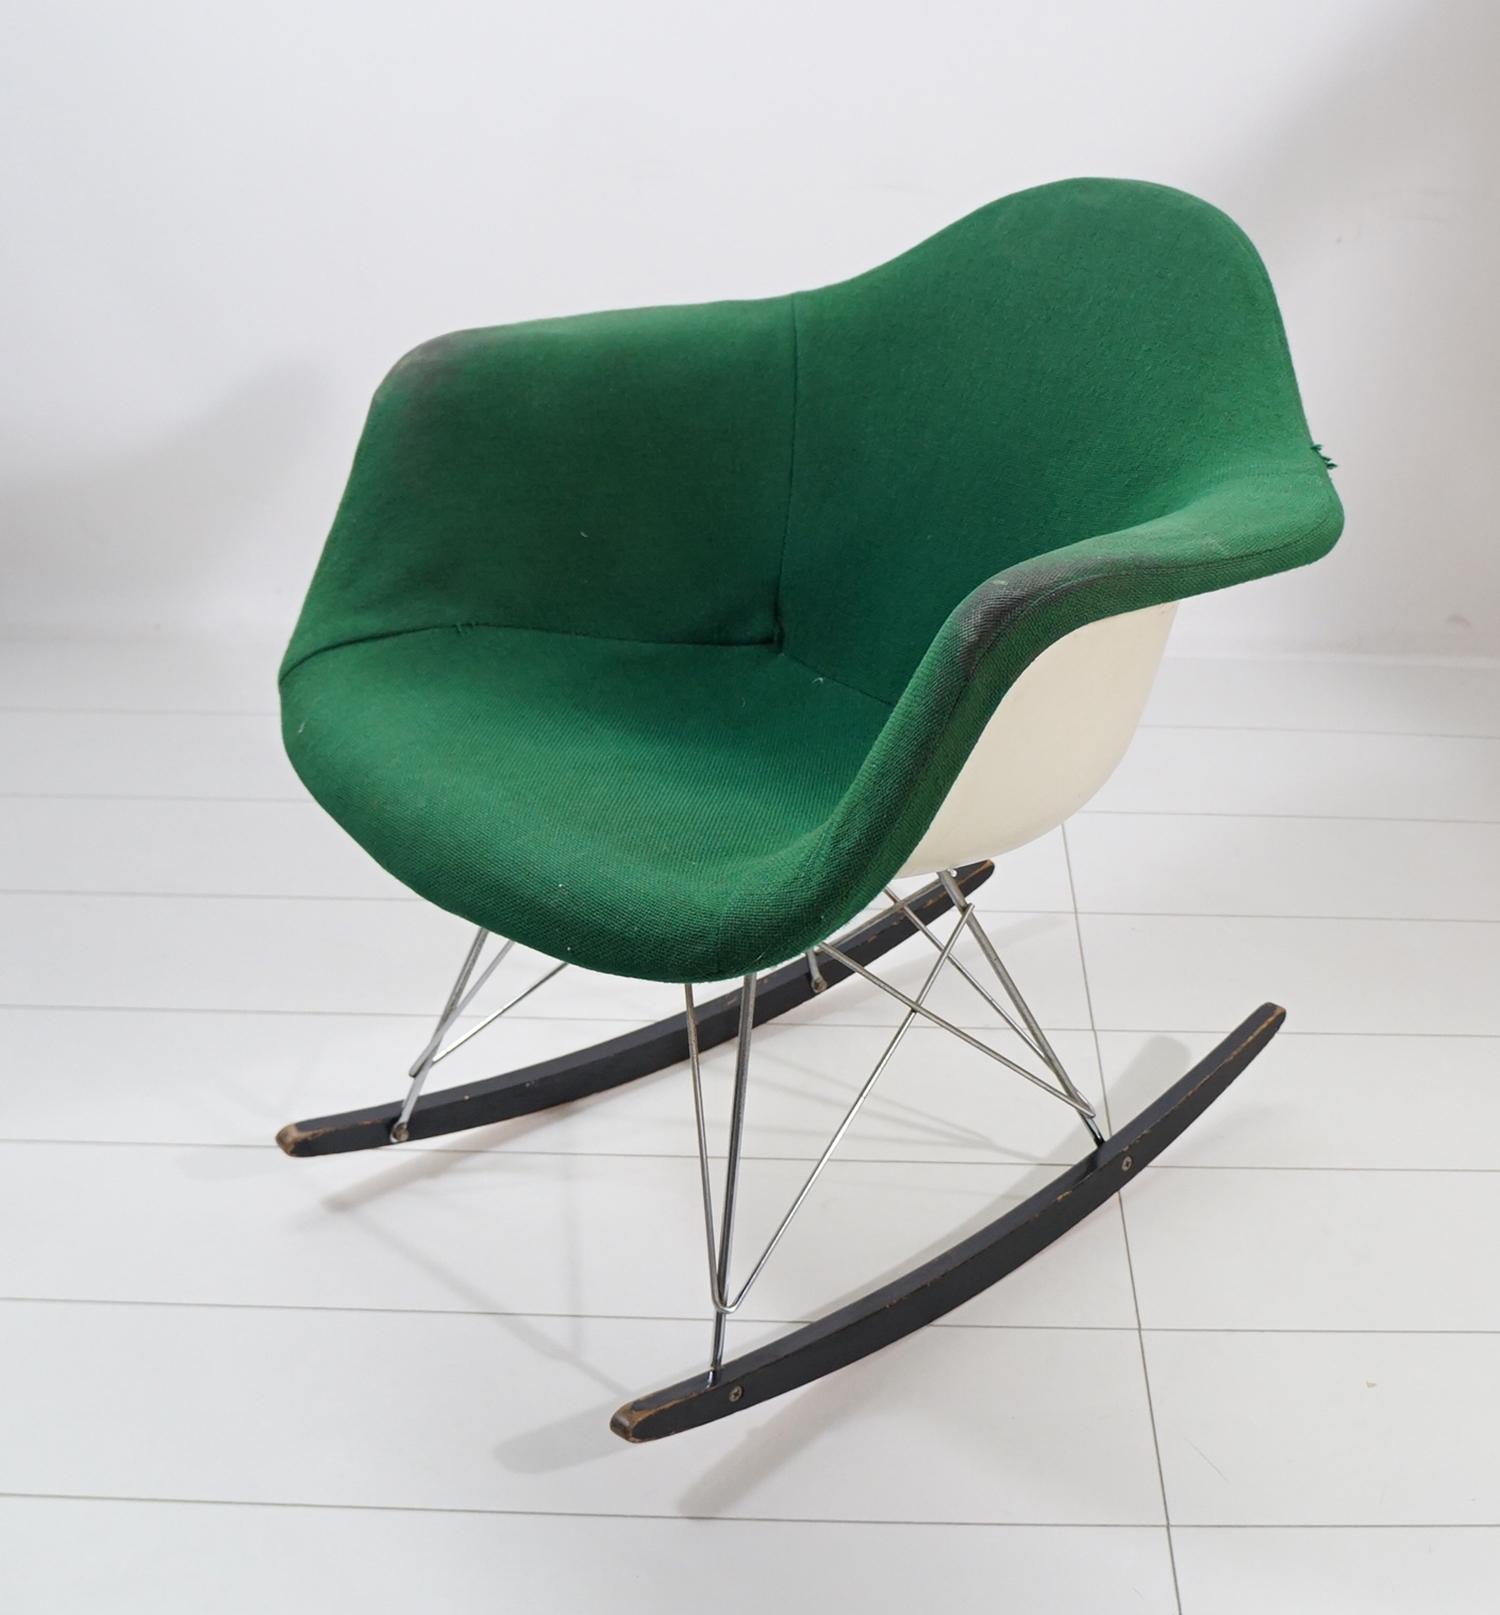 hermann miller charles eames schaukelstuhl rocker rocking chair. Black Bedroom Furniture Sets. Home Design Ideas